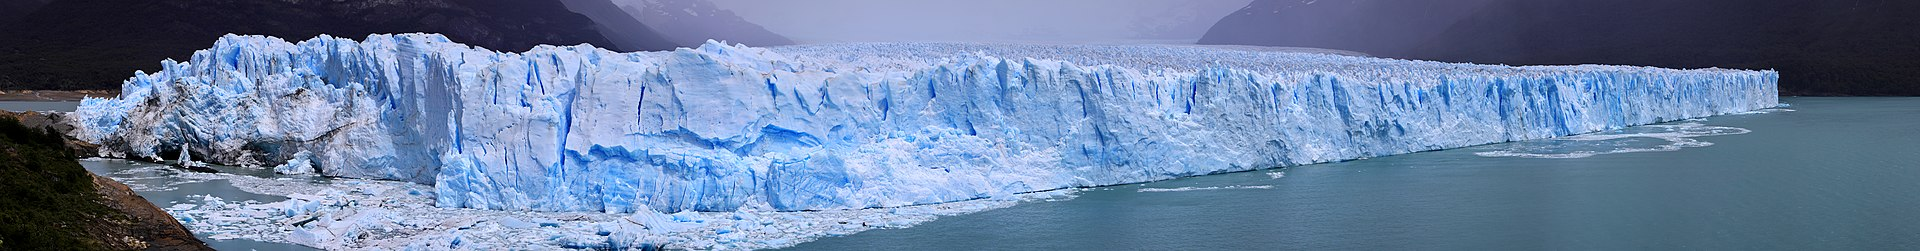 l'ouverture de la saison-->1ère dans salso moreno 1920px-155_-_Glacier_Perito_Moreno_-_Panorama_de_la_partie_nord_-_Janvier_2010